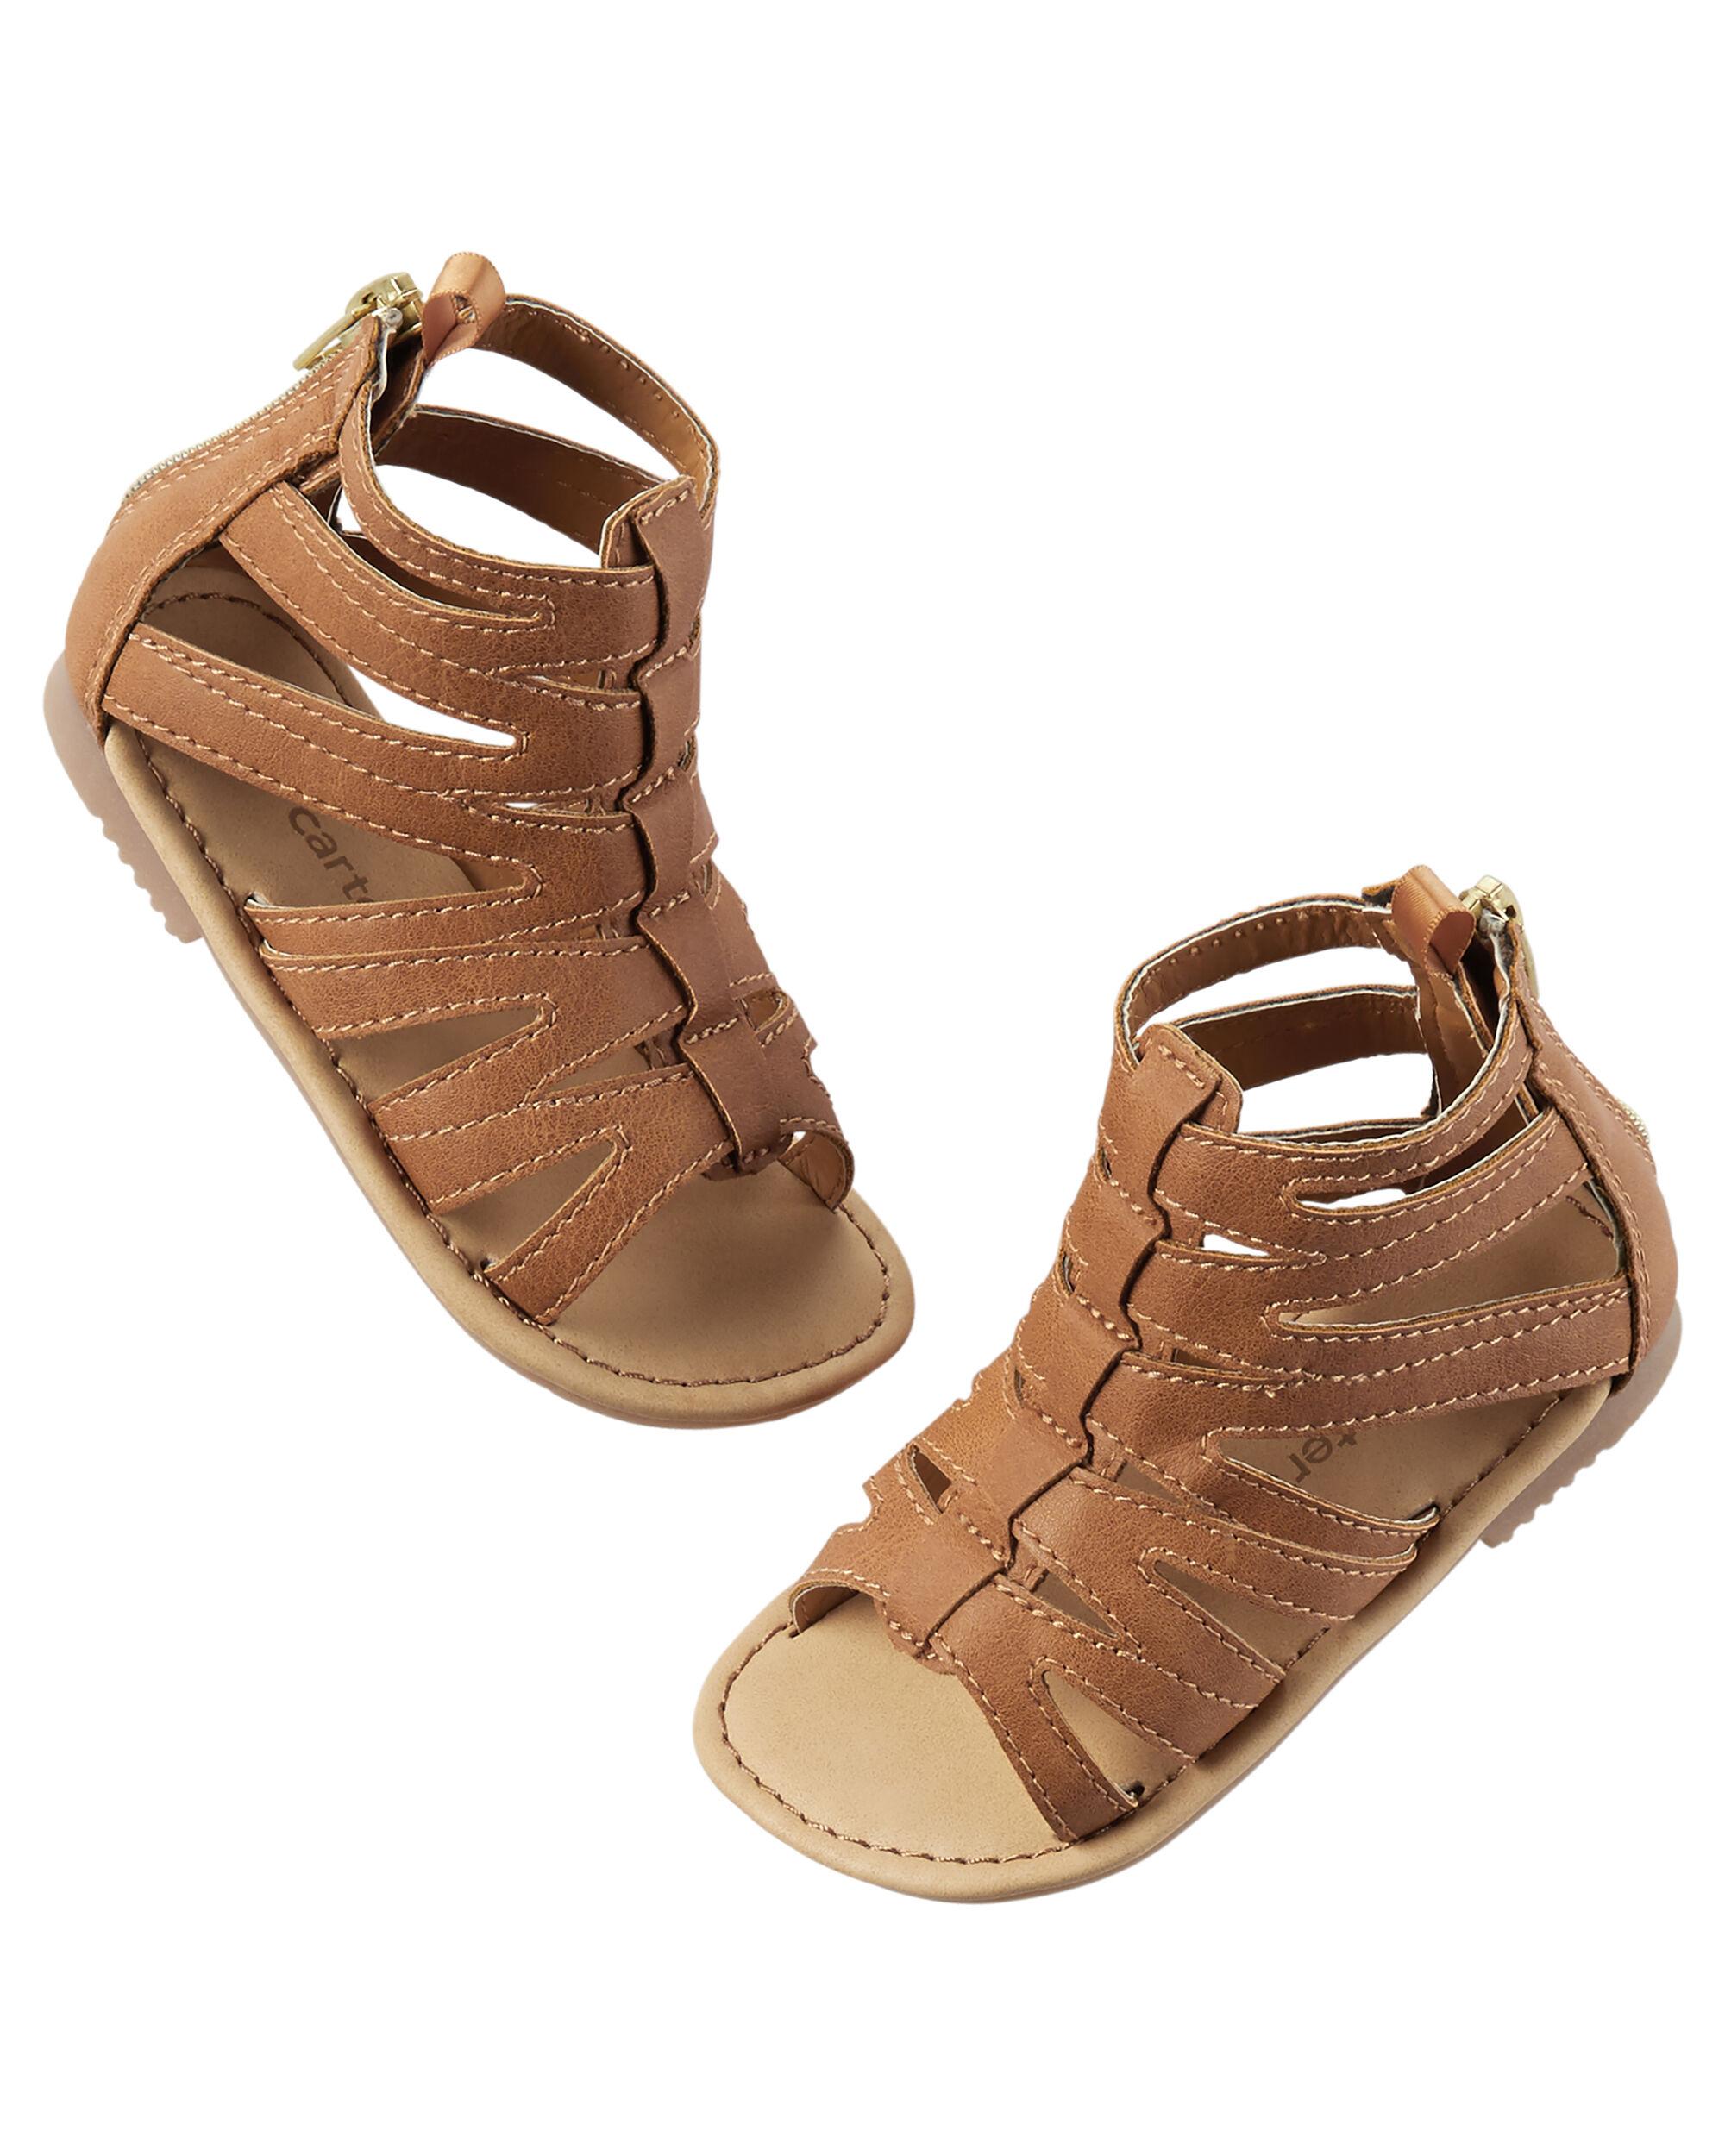 Carter's Gladiator Sandals   carters.com